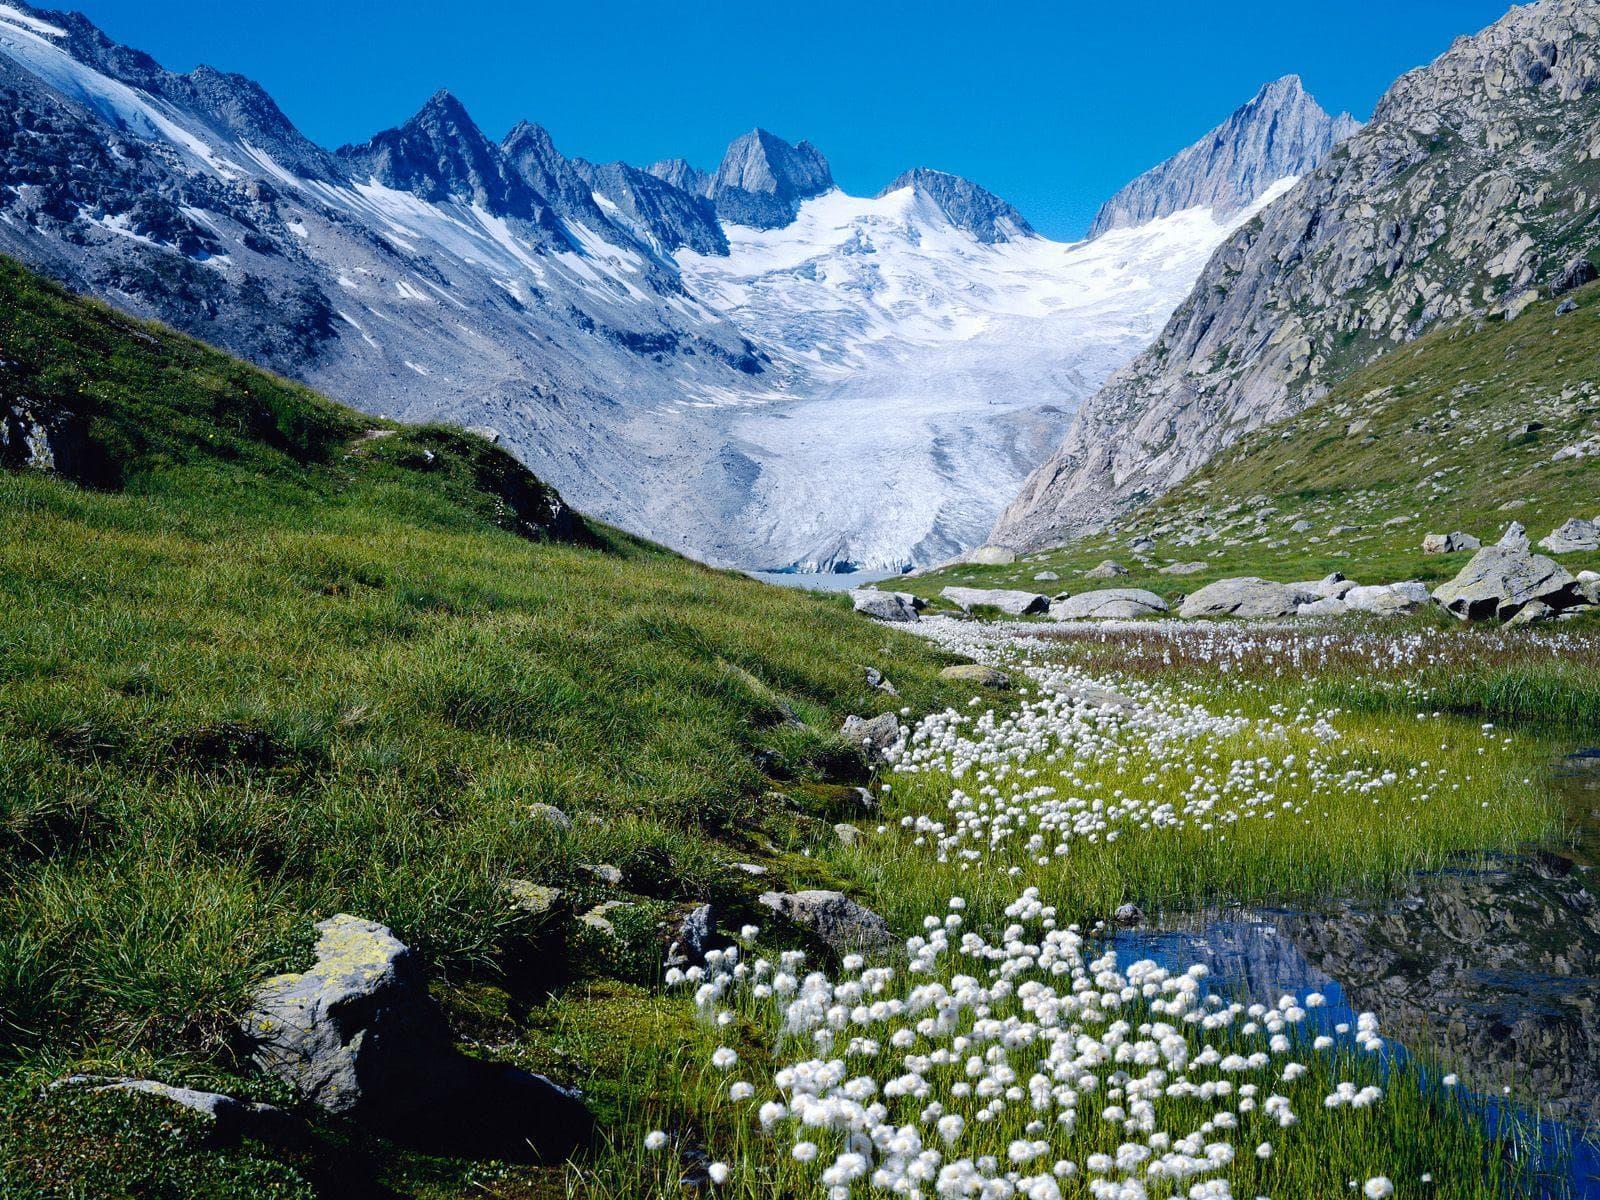 Random Best Countries for Mountain Climbing